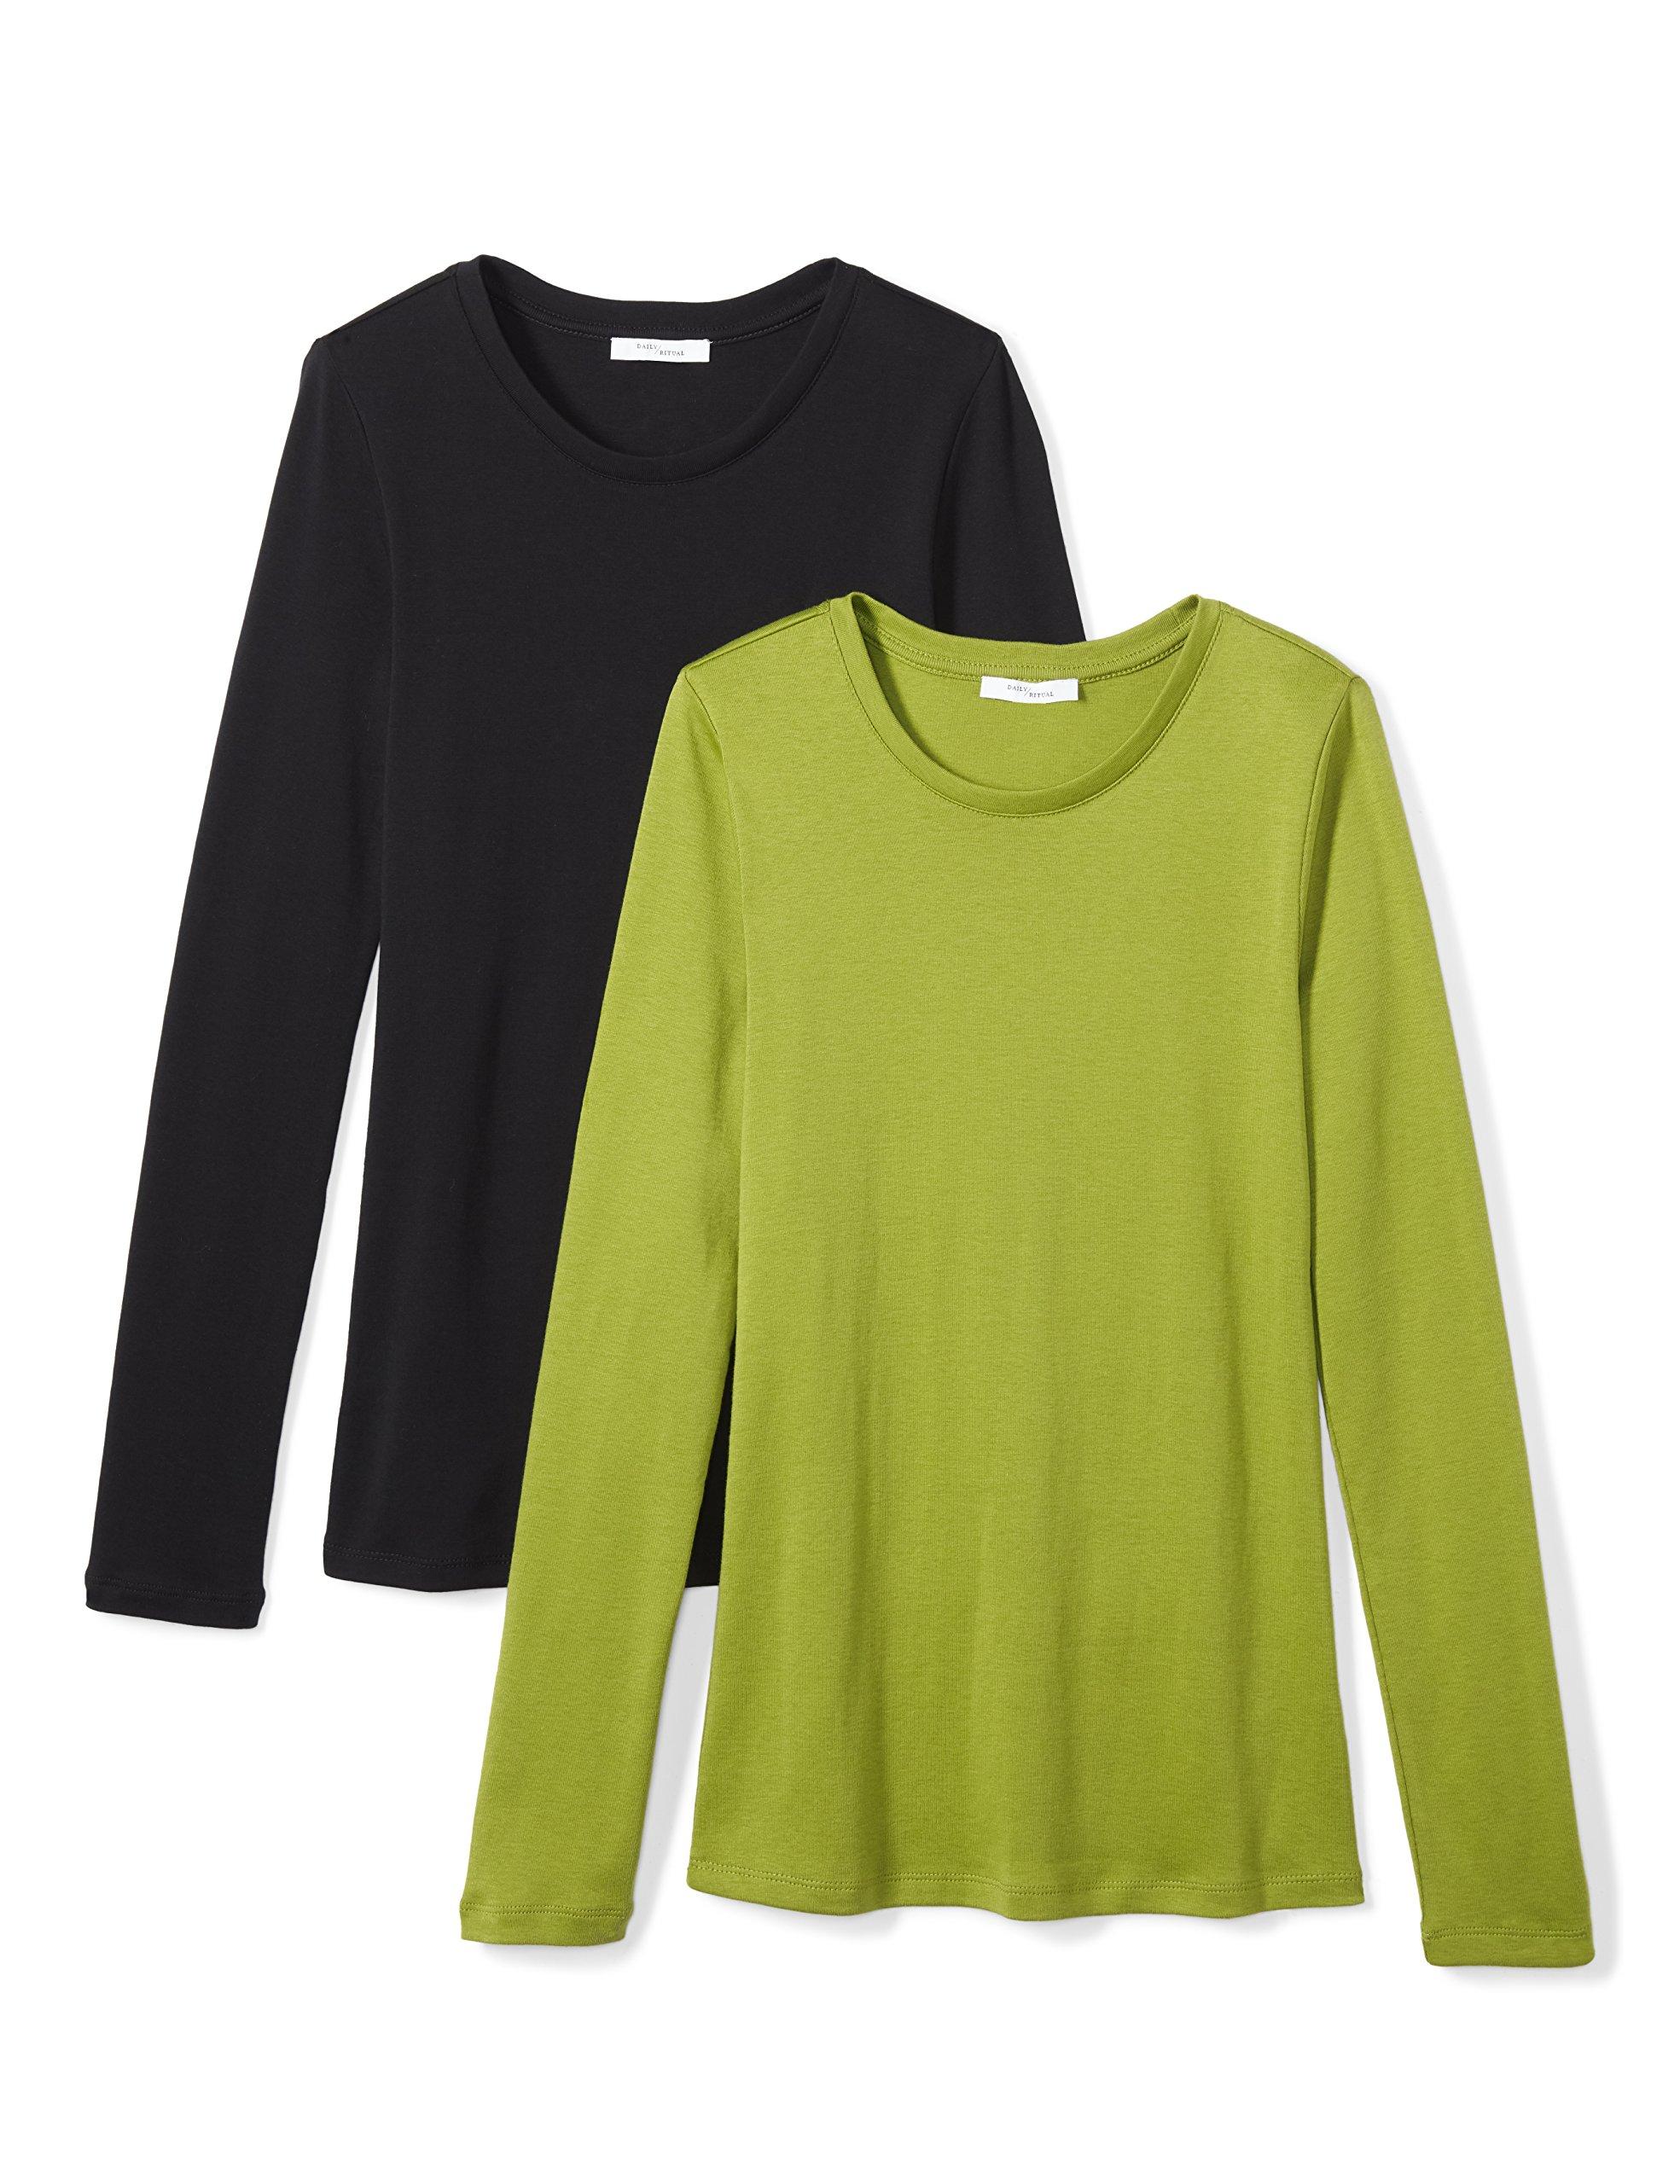 Daily Ritual Women's Midweight 100% Supima Cotton Rib Knit Long-Sleeve Crew Neck T-Shirt, 2-Pack, XL, Black/Woodbine Green